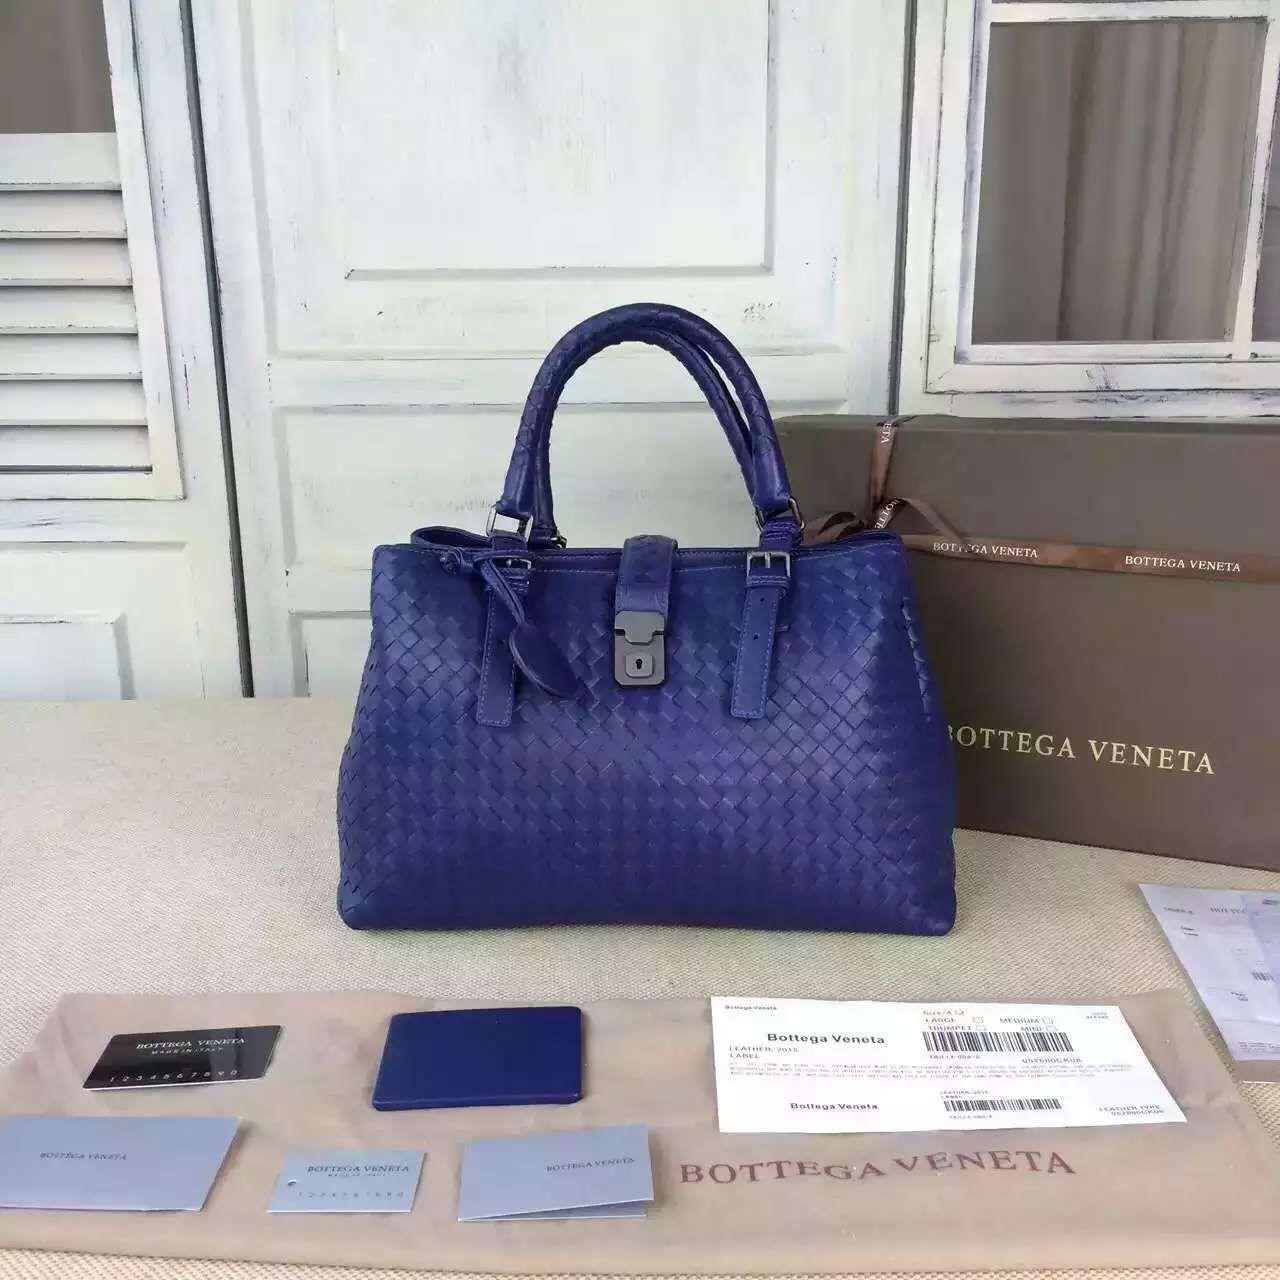 Bottega Veneta Bag Id 37969 For A Yybags